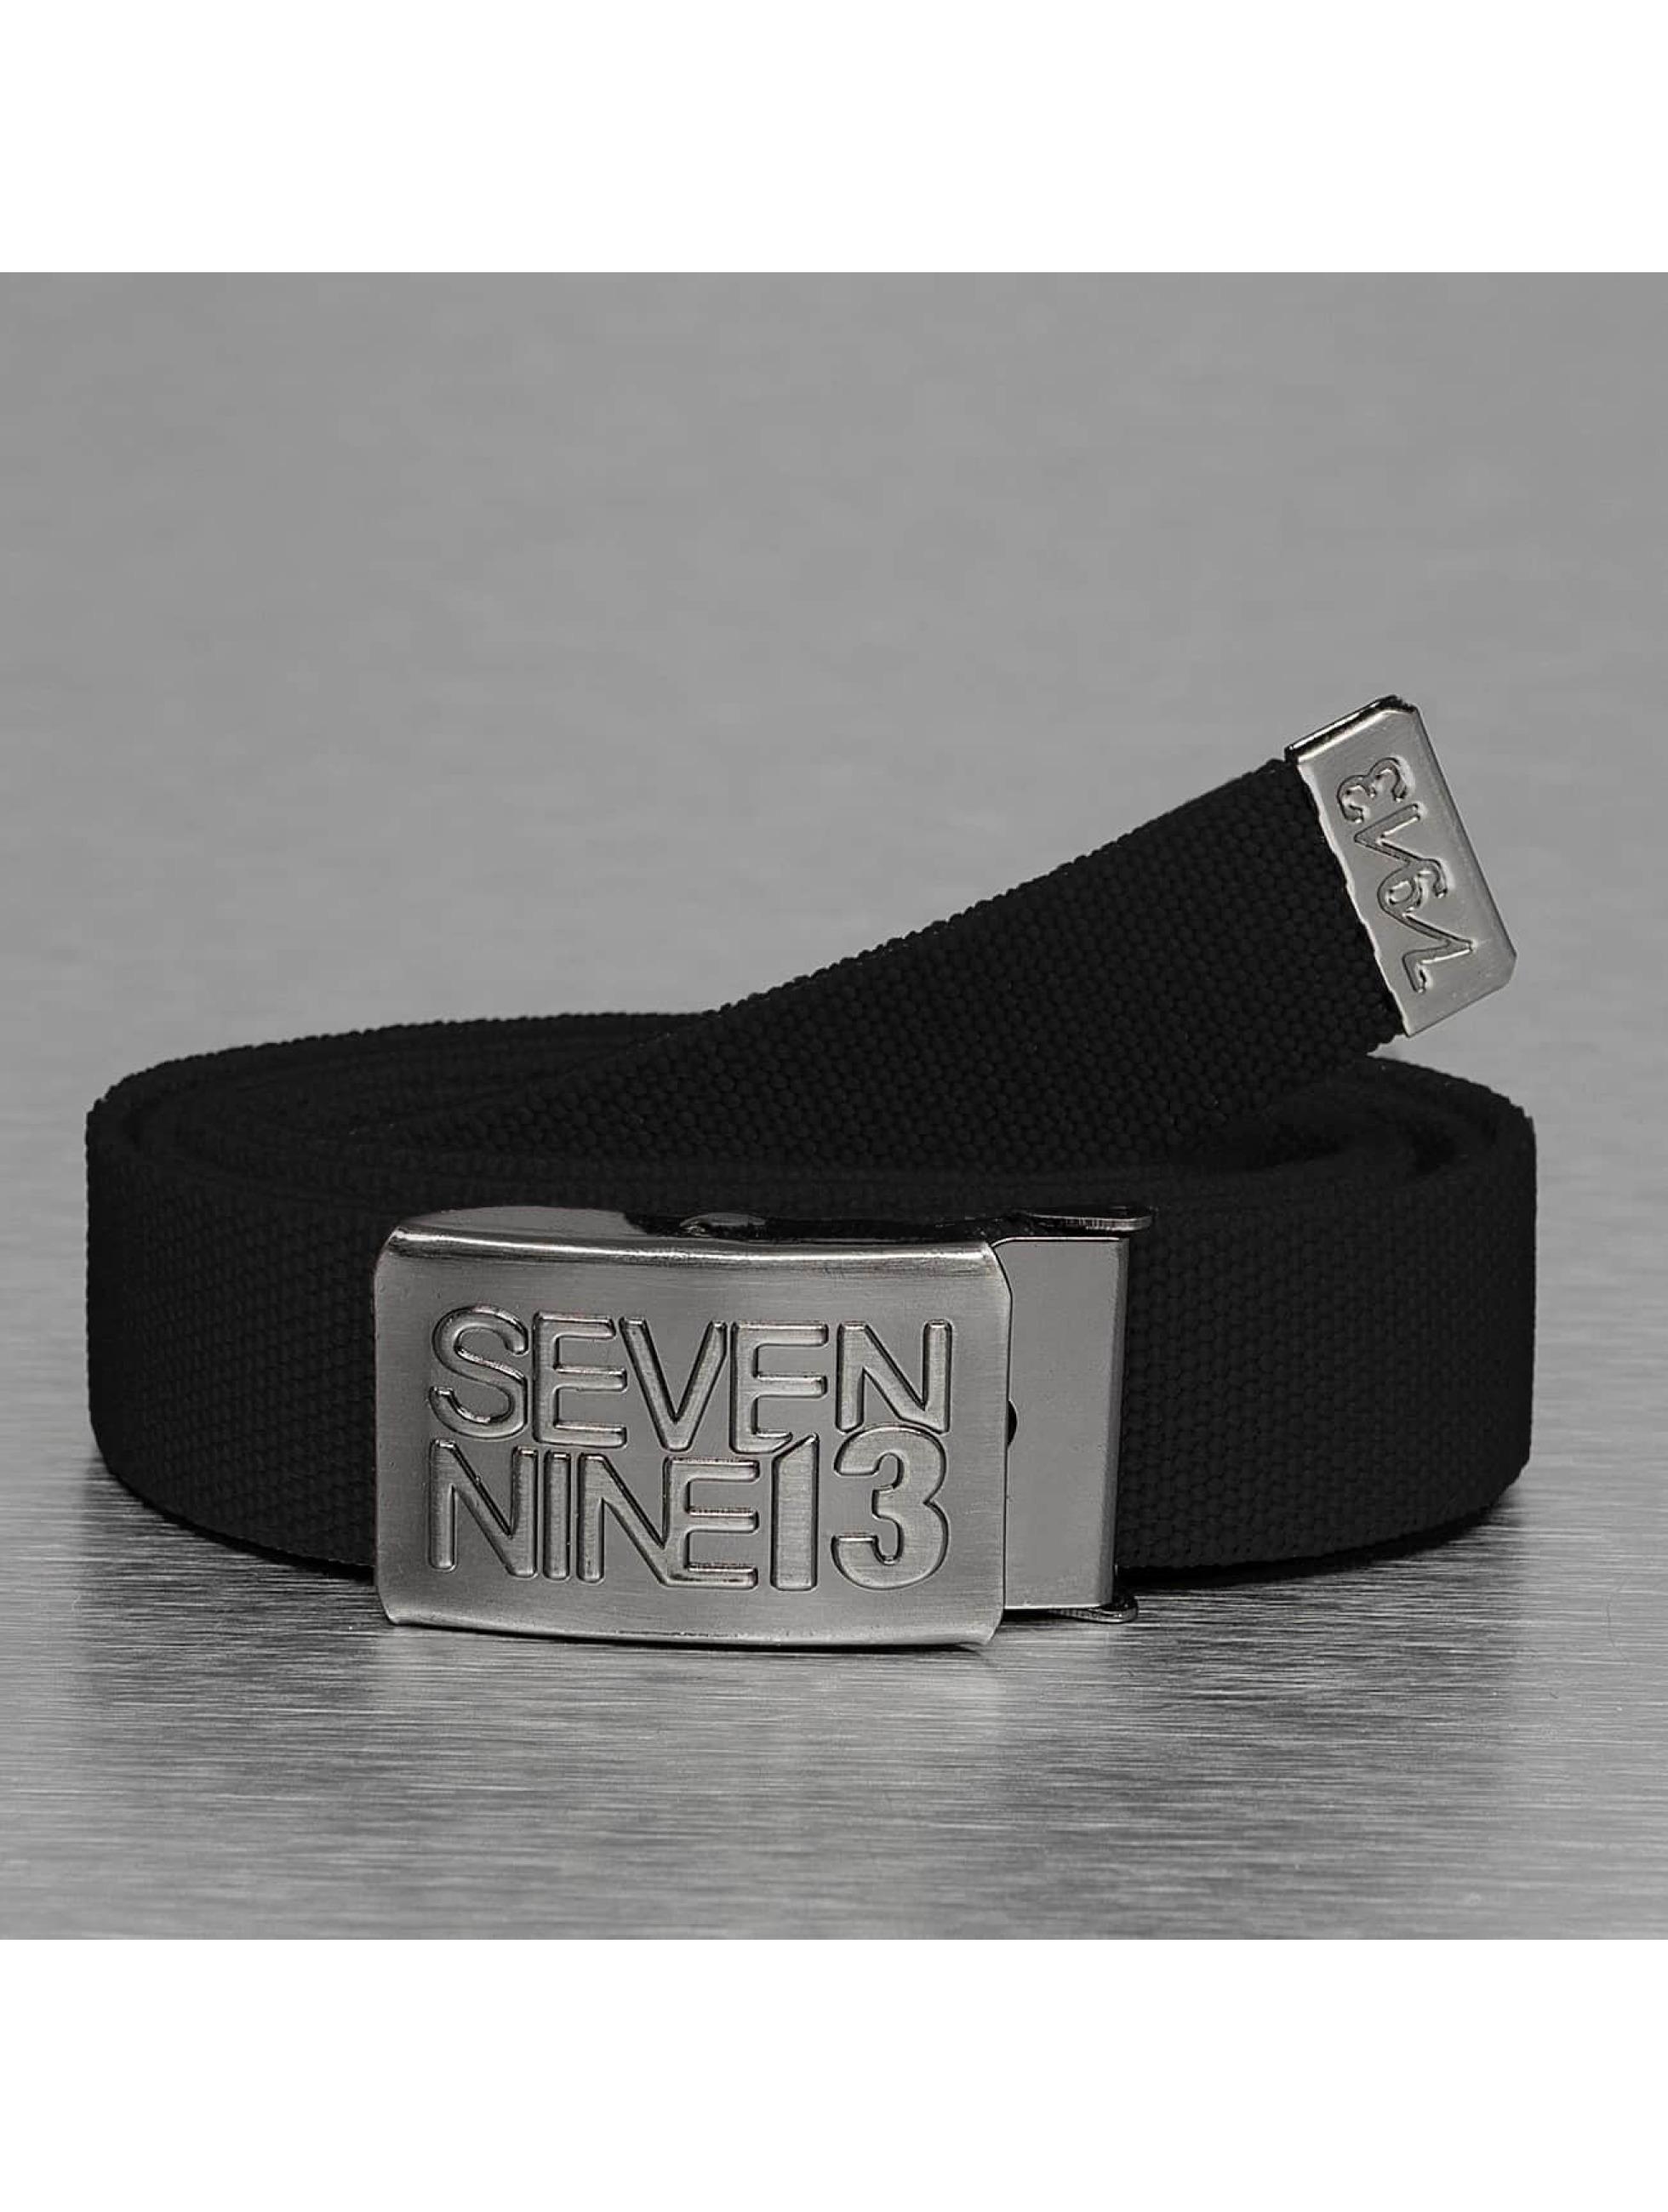 Seven Nine 13 Ремень Jaws Stretch черный